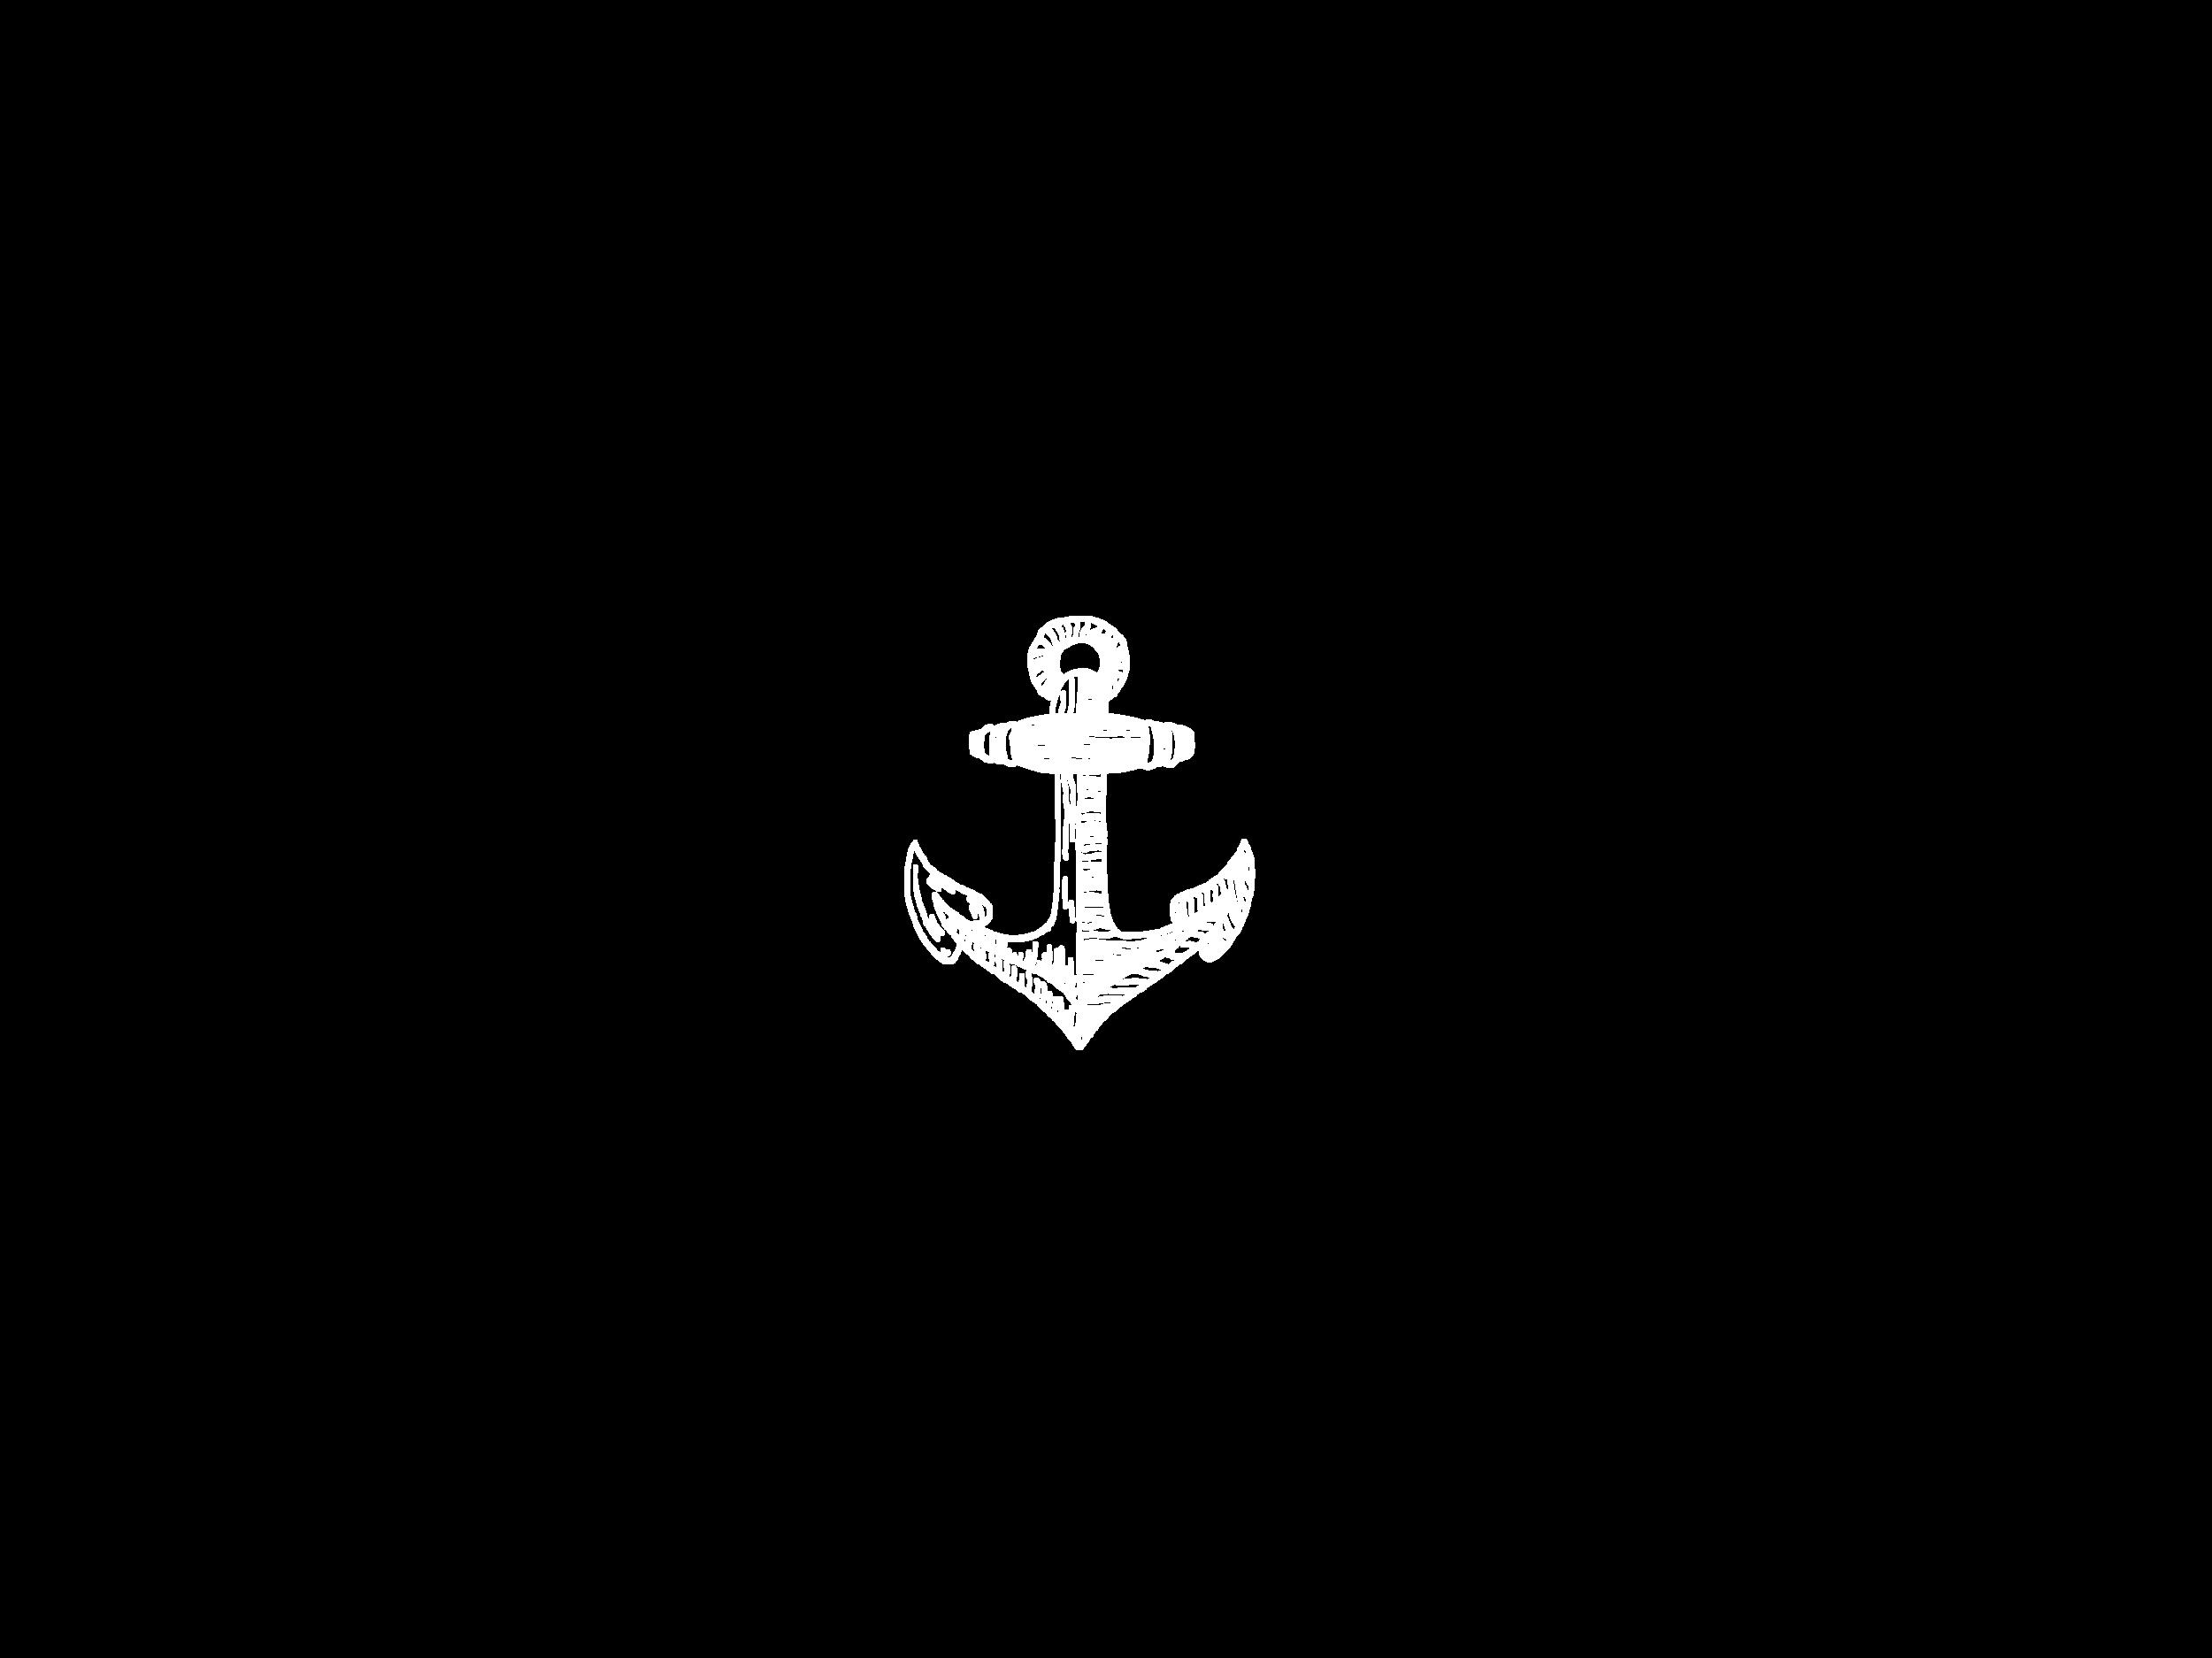 anchorwhitepriveledge.png